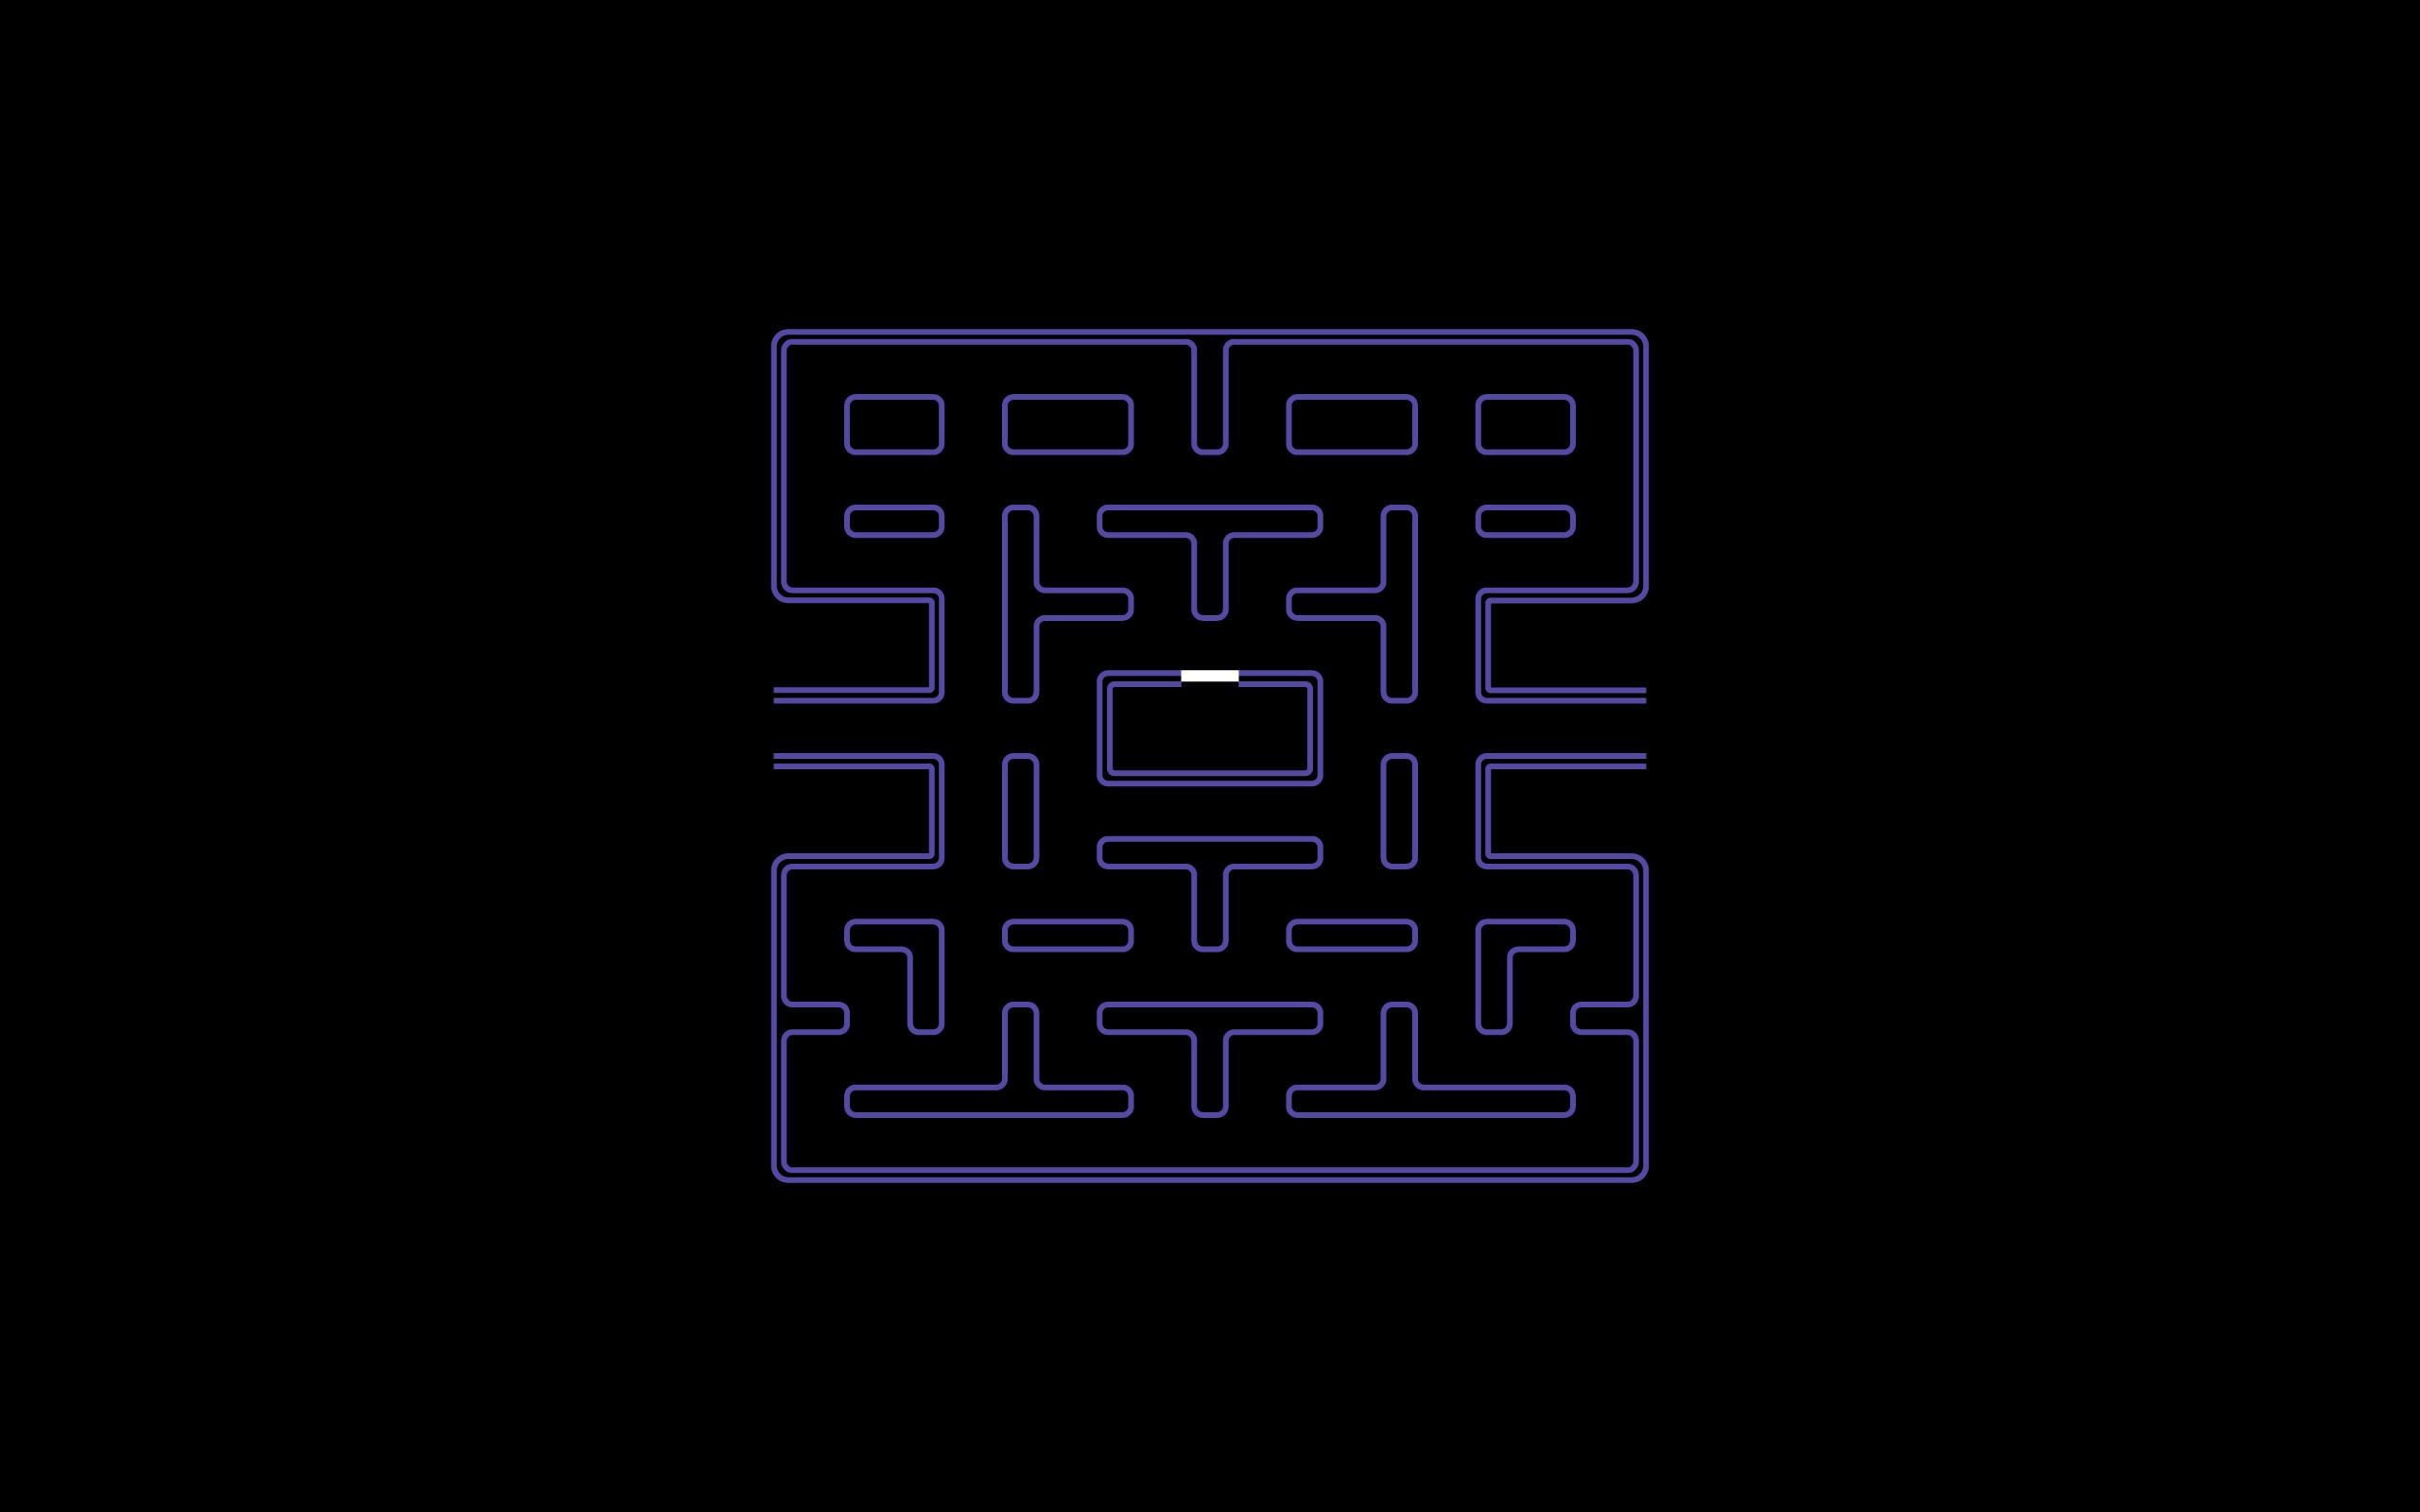 Pacman Wallpaper 73 Pictures